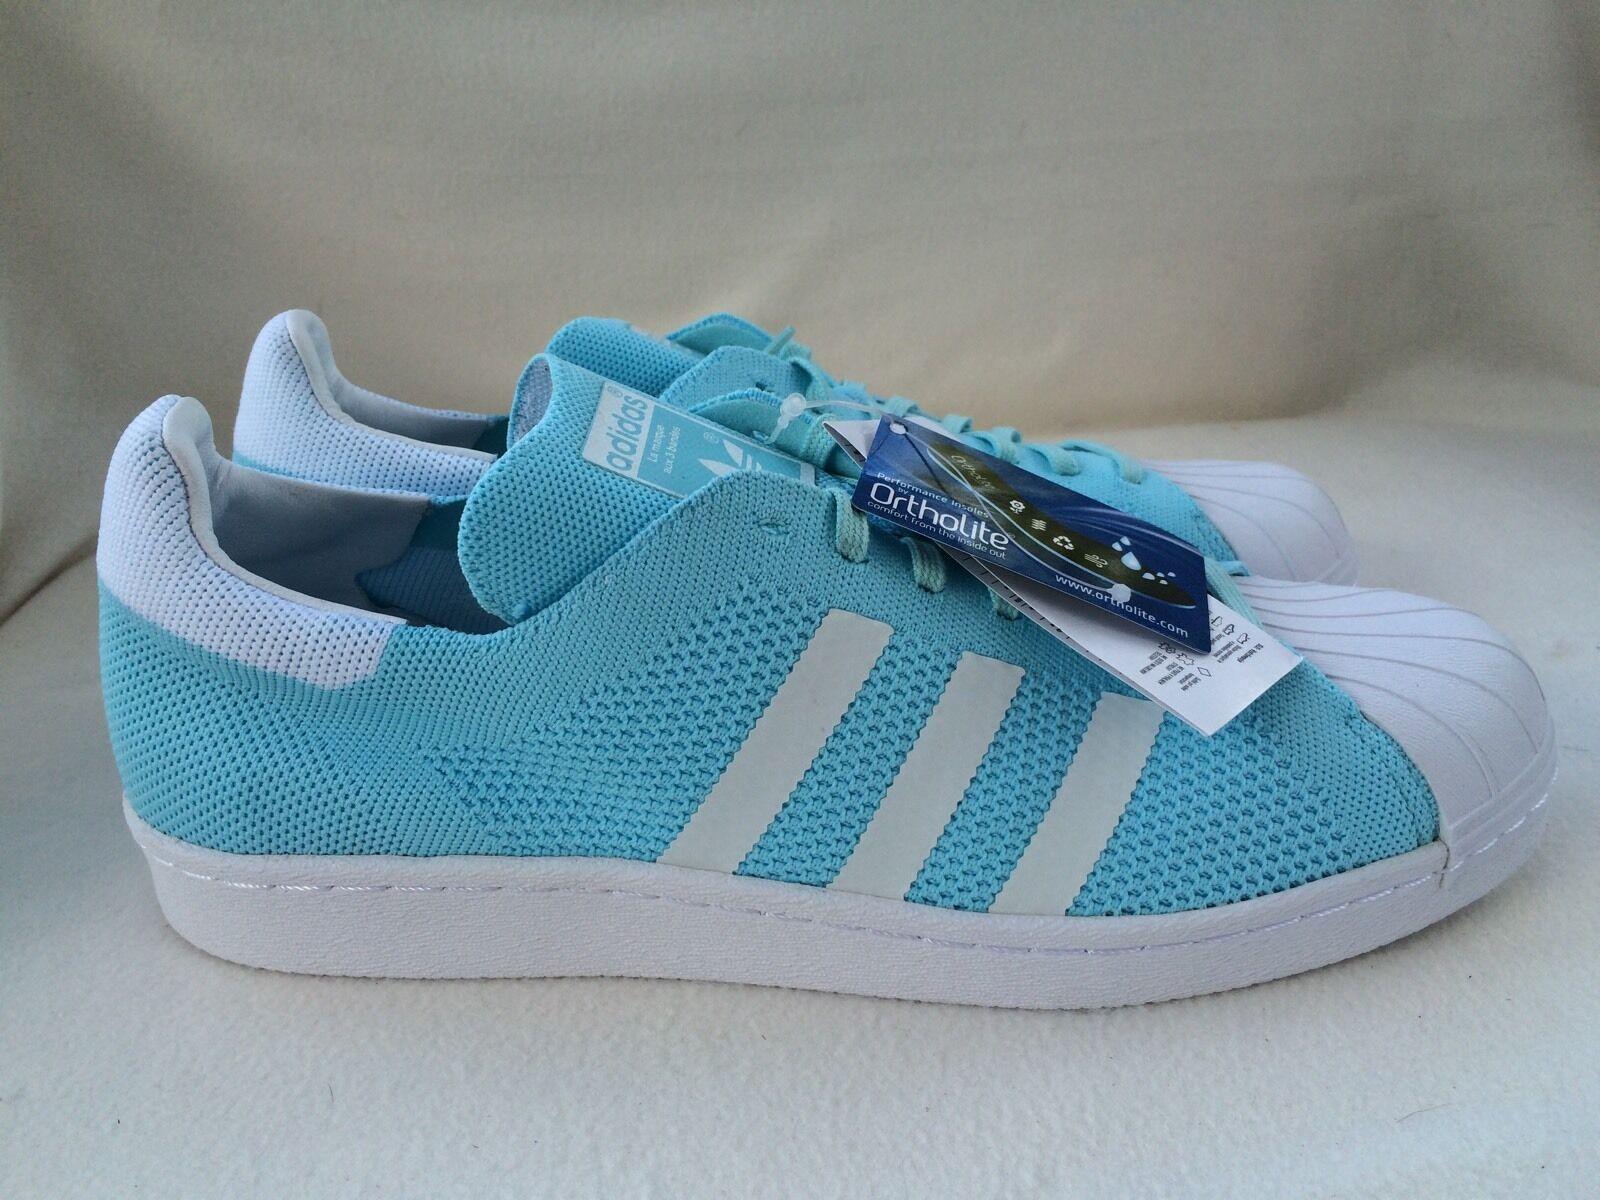 Adidas Para Superstar Primeknit Entrenadores Unido Azul/Blanco Reino Unido Entrenadores 2d5cbf